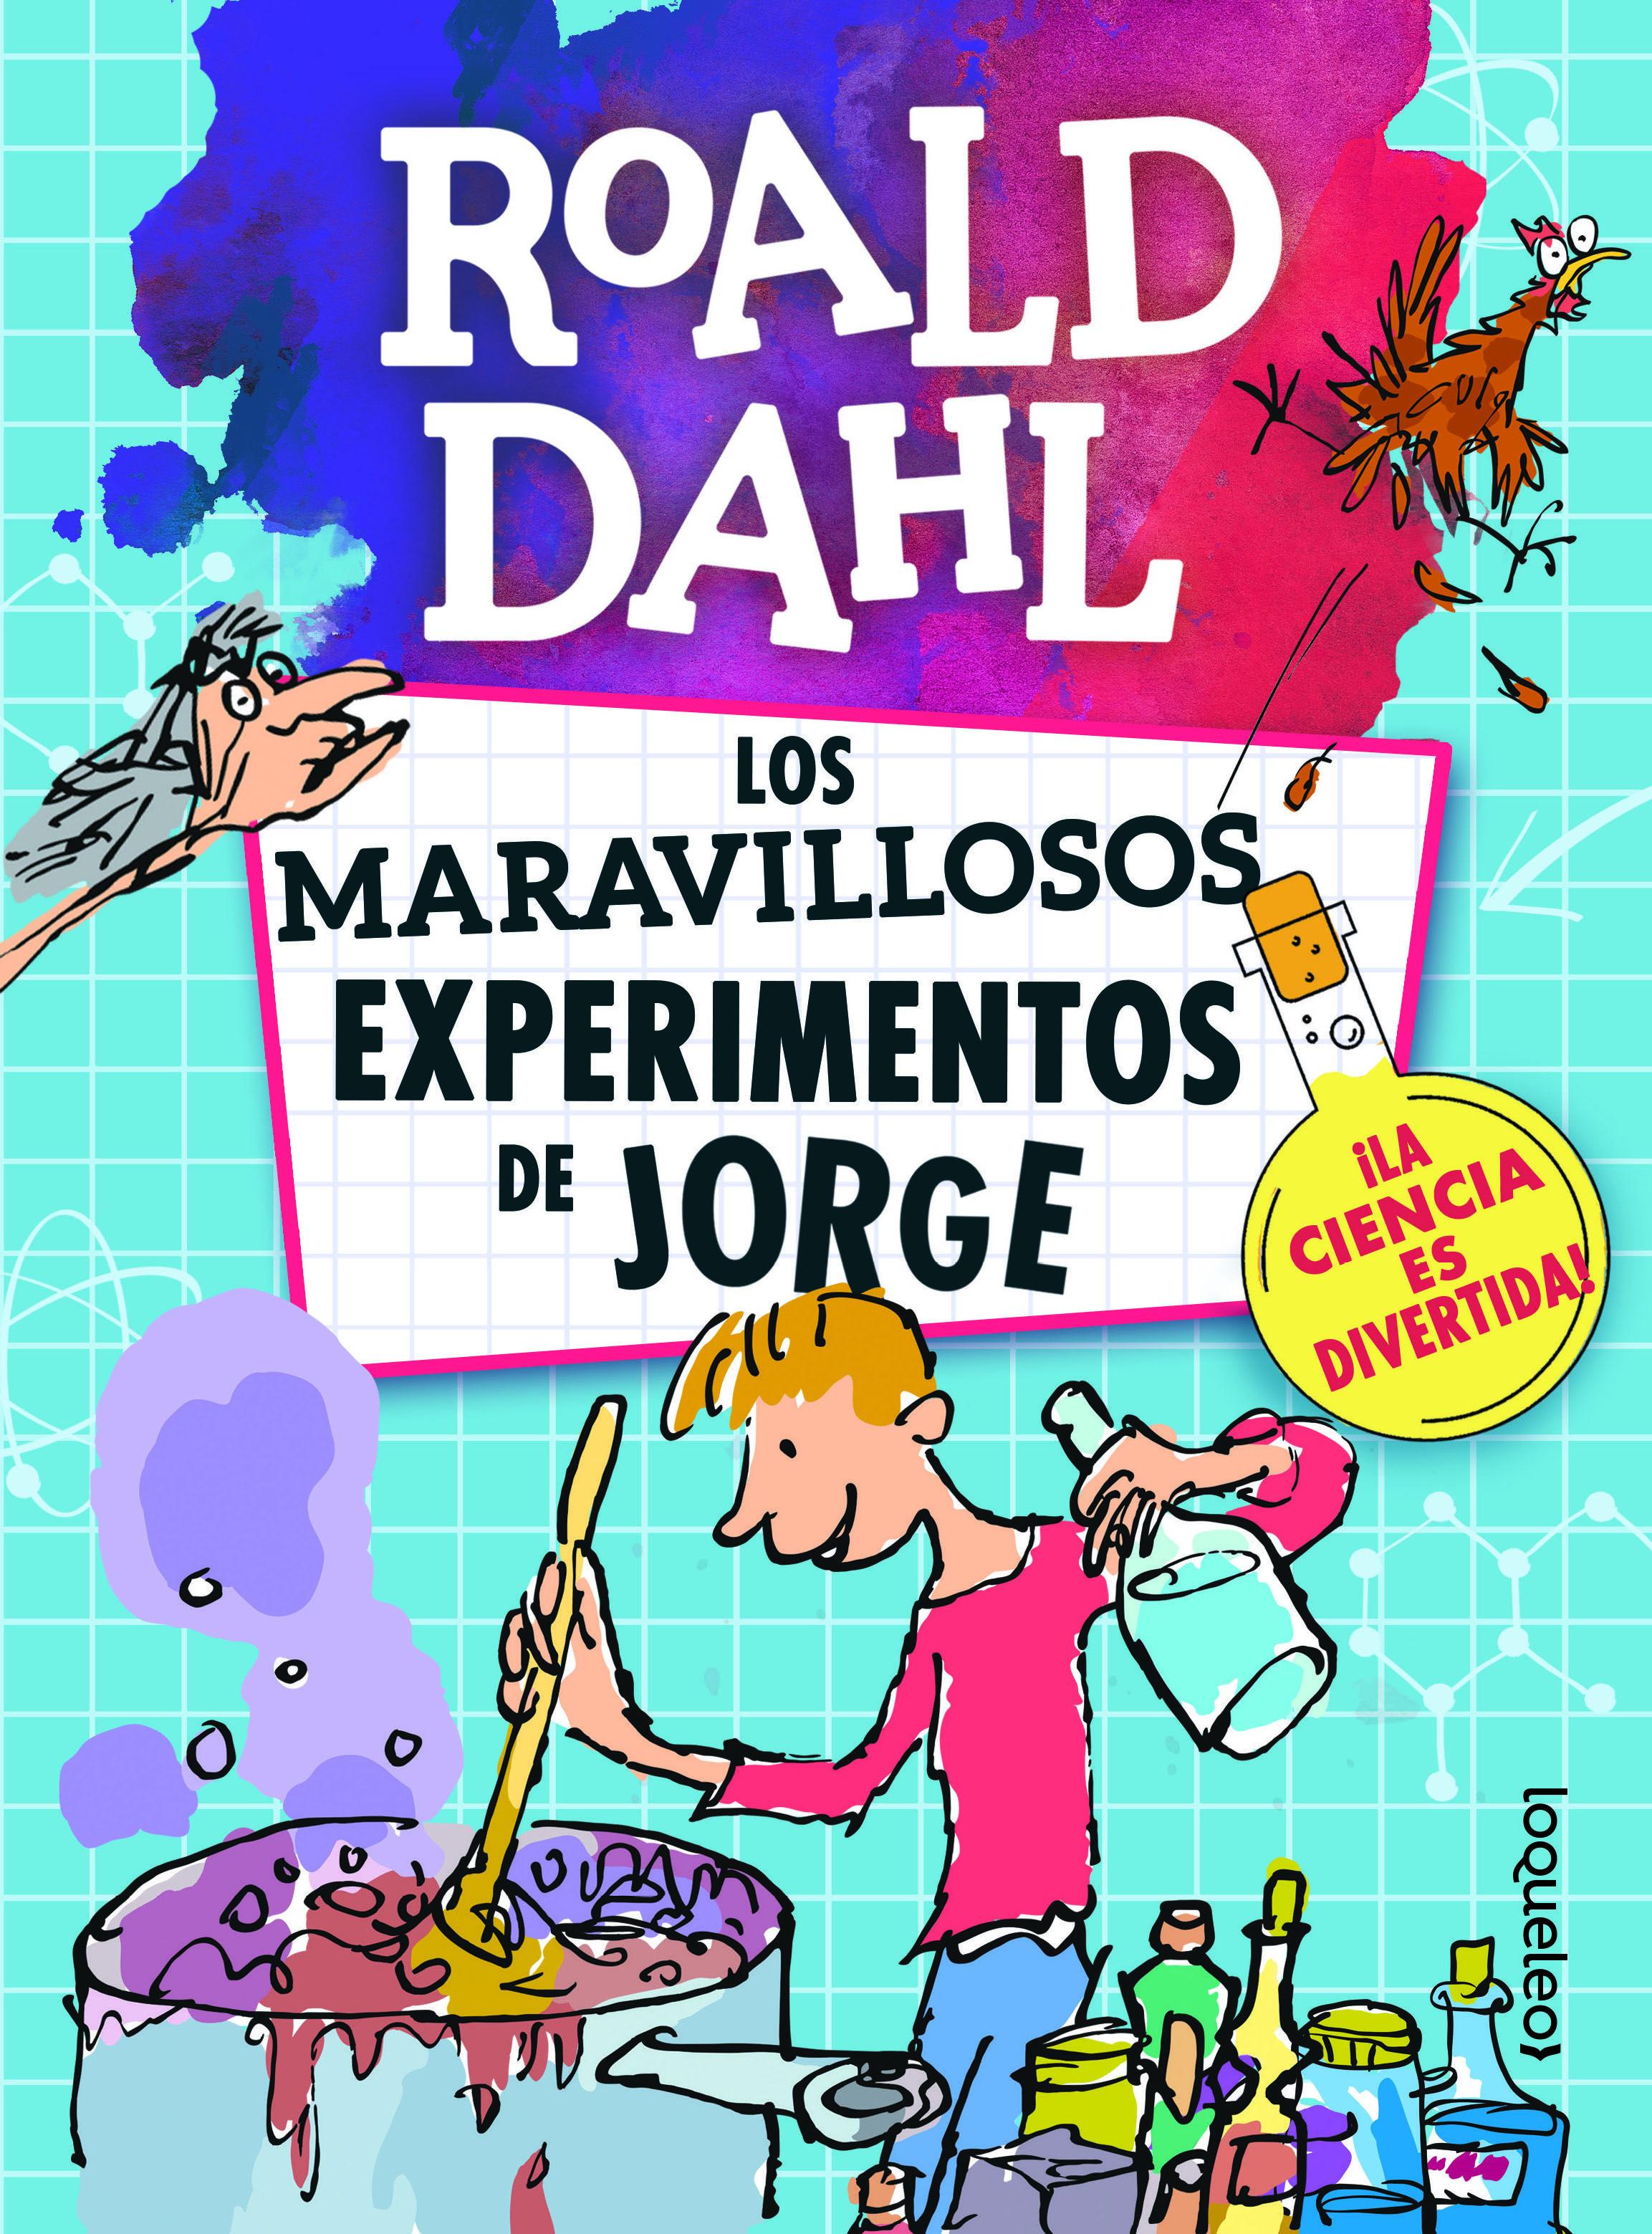 MARAVILLOSOS EXPERIMENTOS DE JORGE